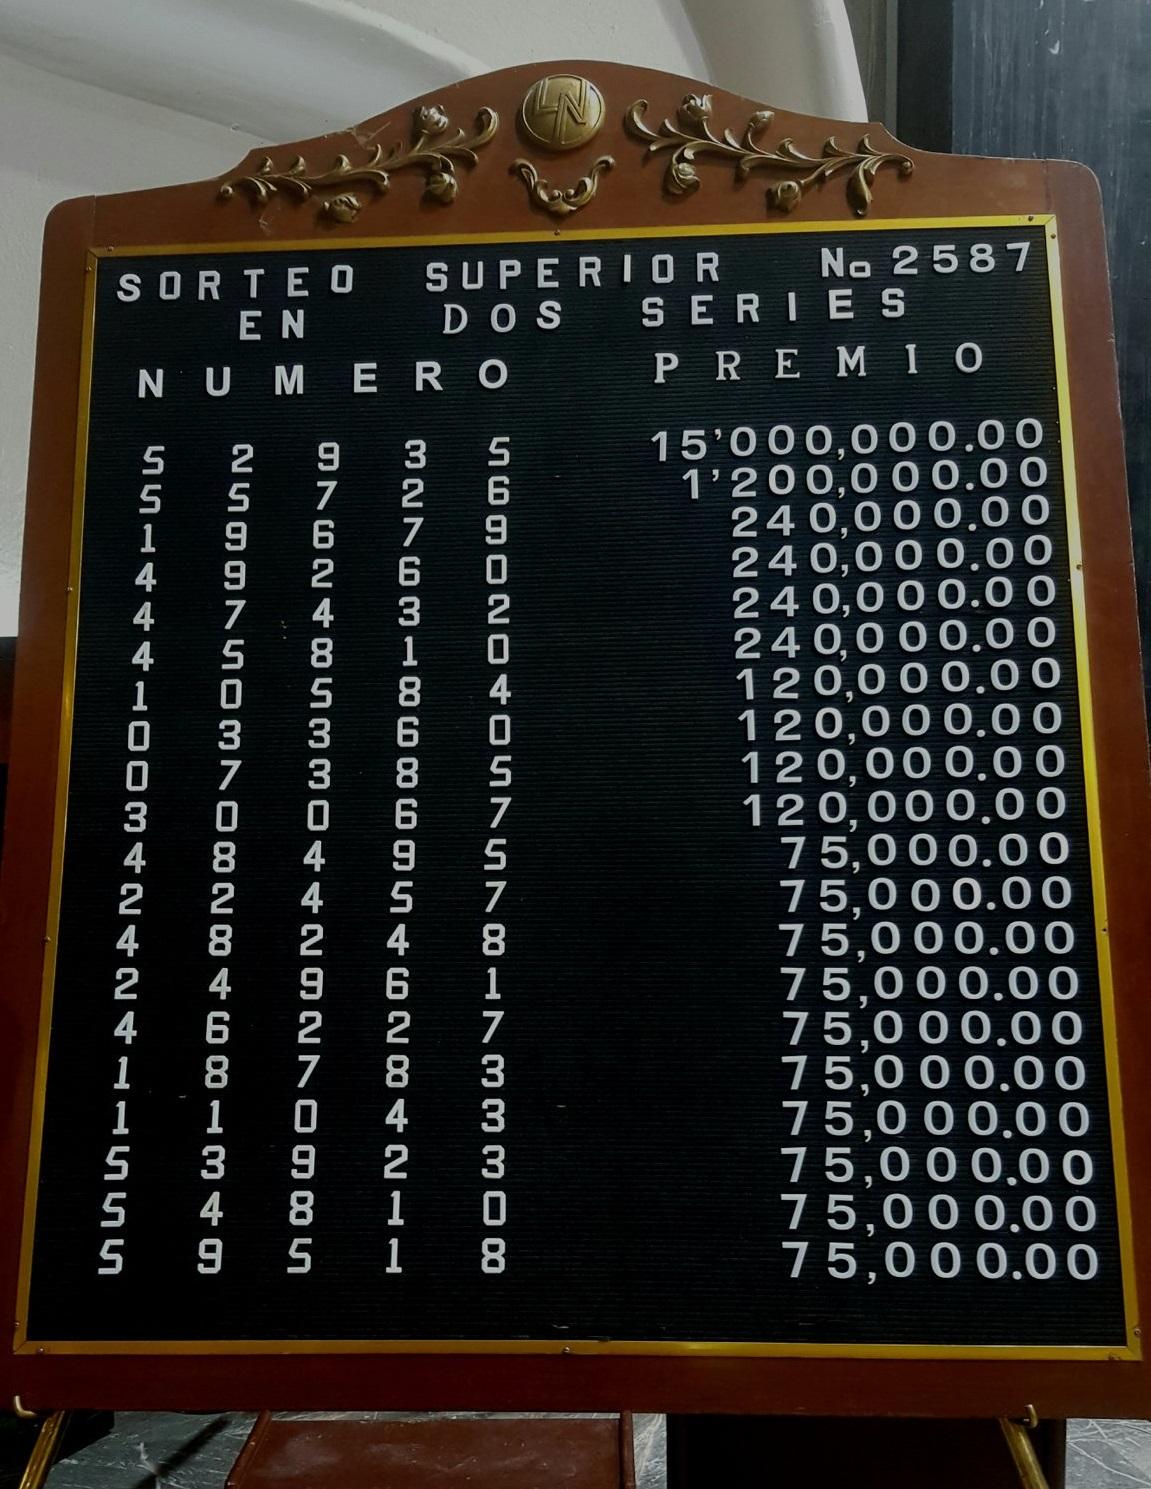 Sorteo Superior 2587